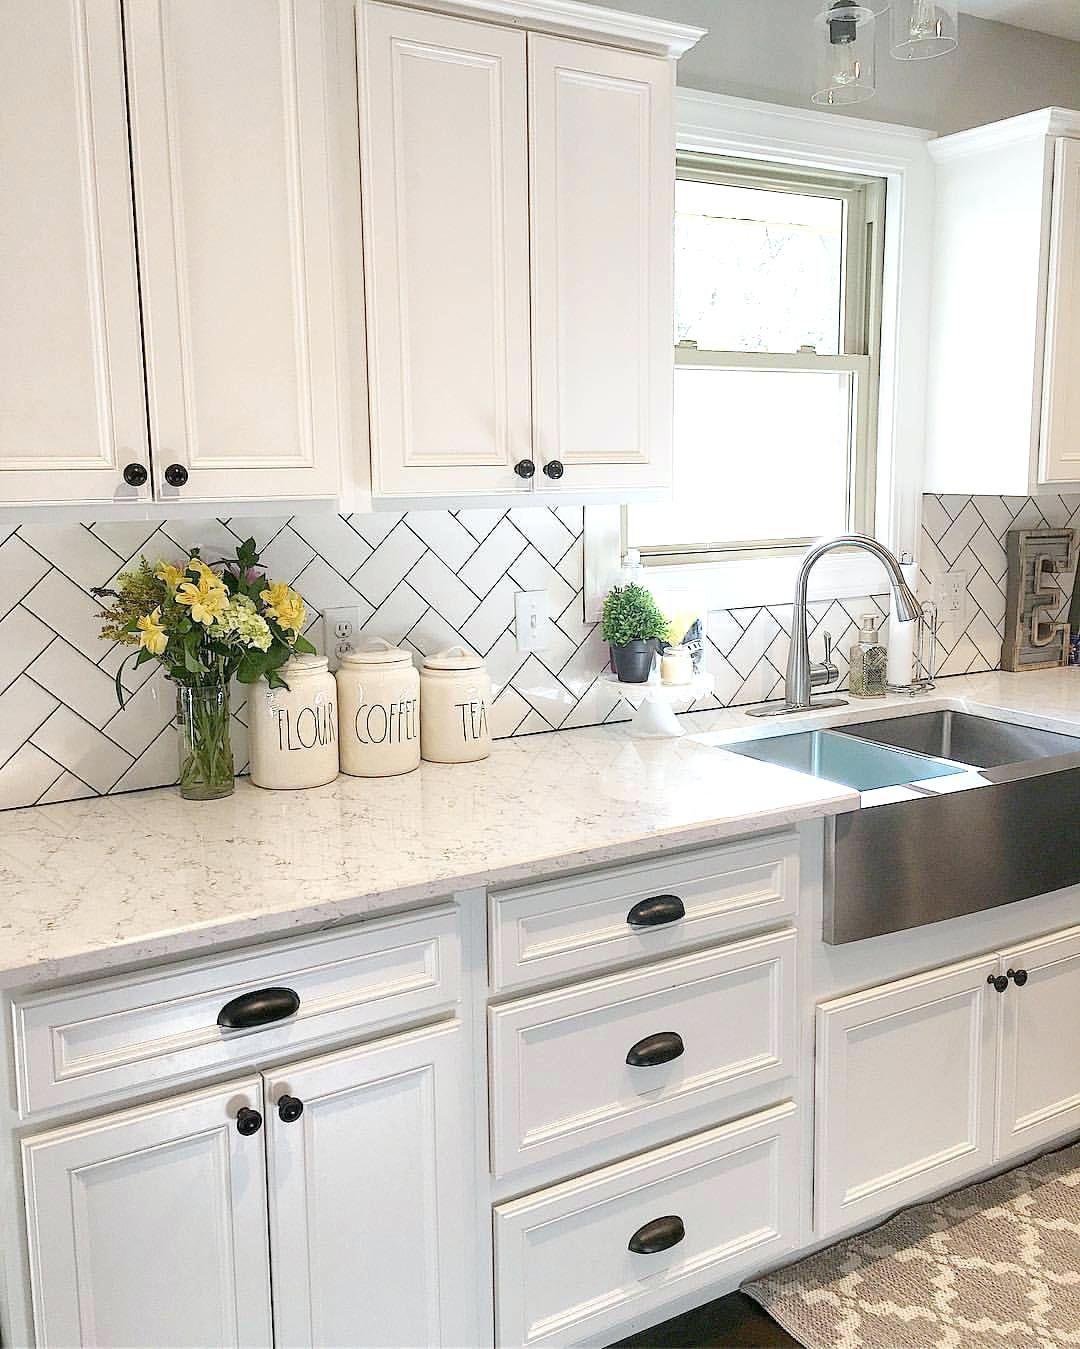 Pin By Nikki Tracy On Dreamin Future Home Kitchen Cabinets Decor Kitchen Cabinet Design Kitchen Backsplash Designs